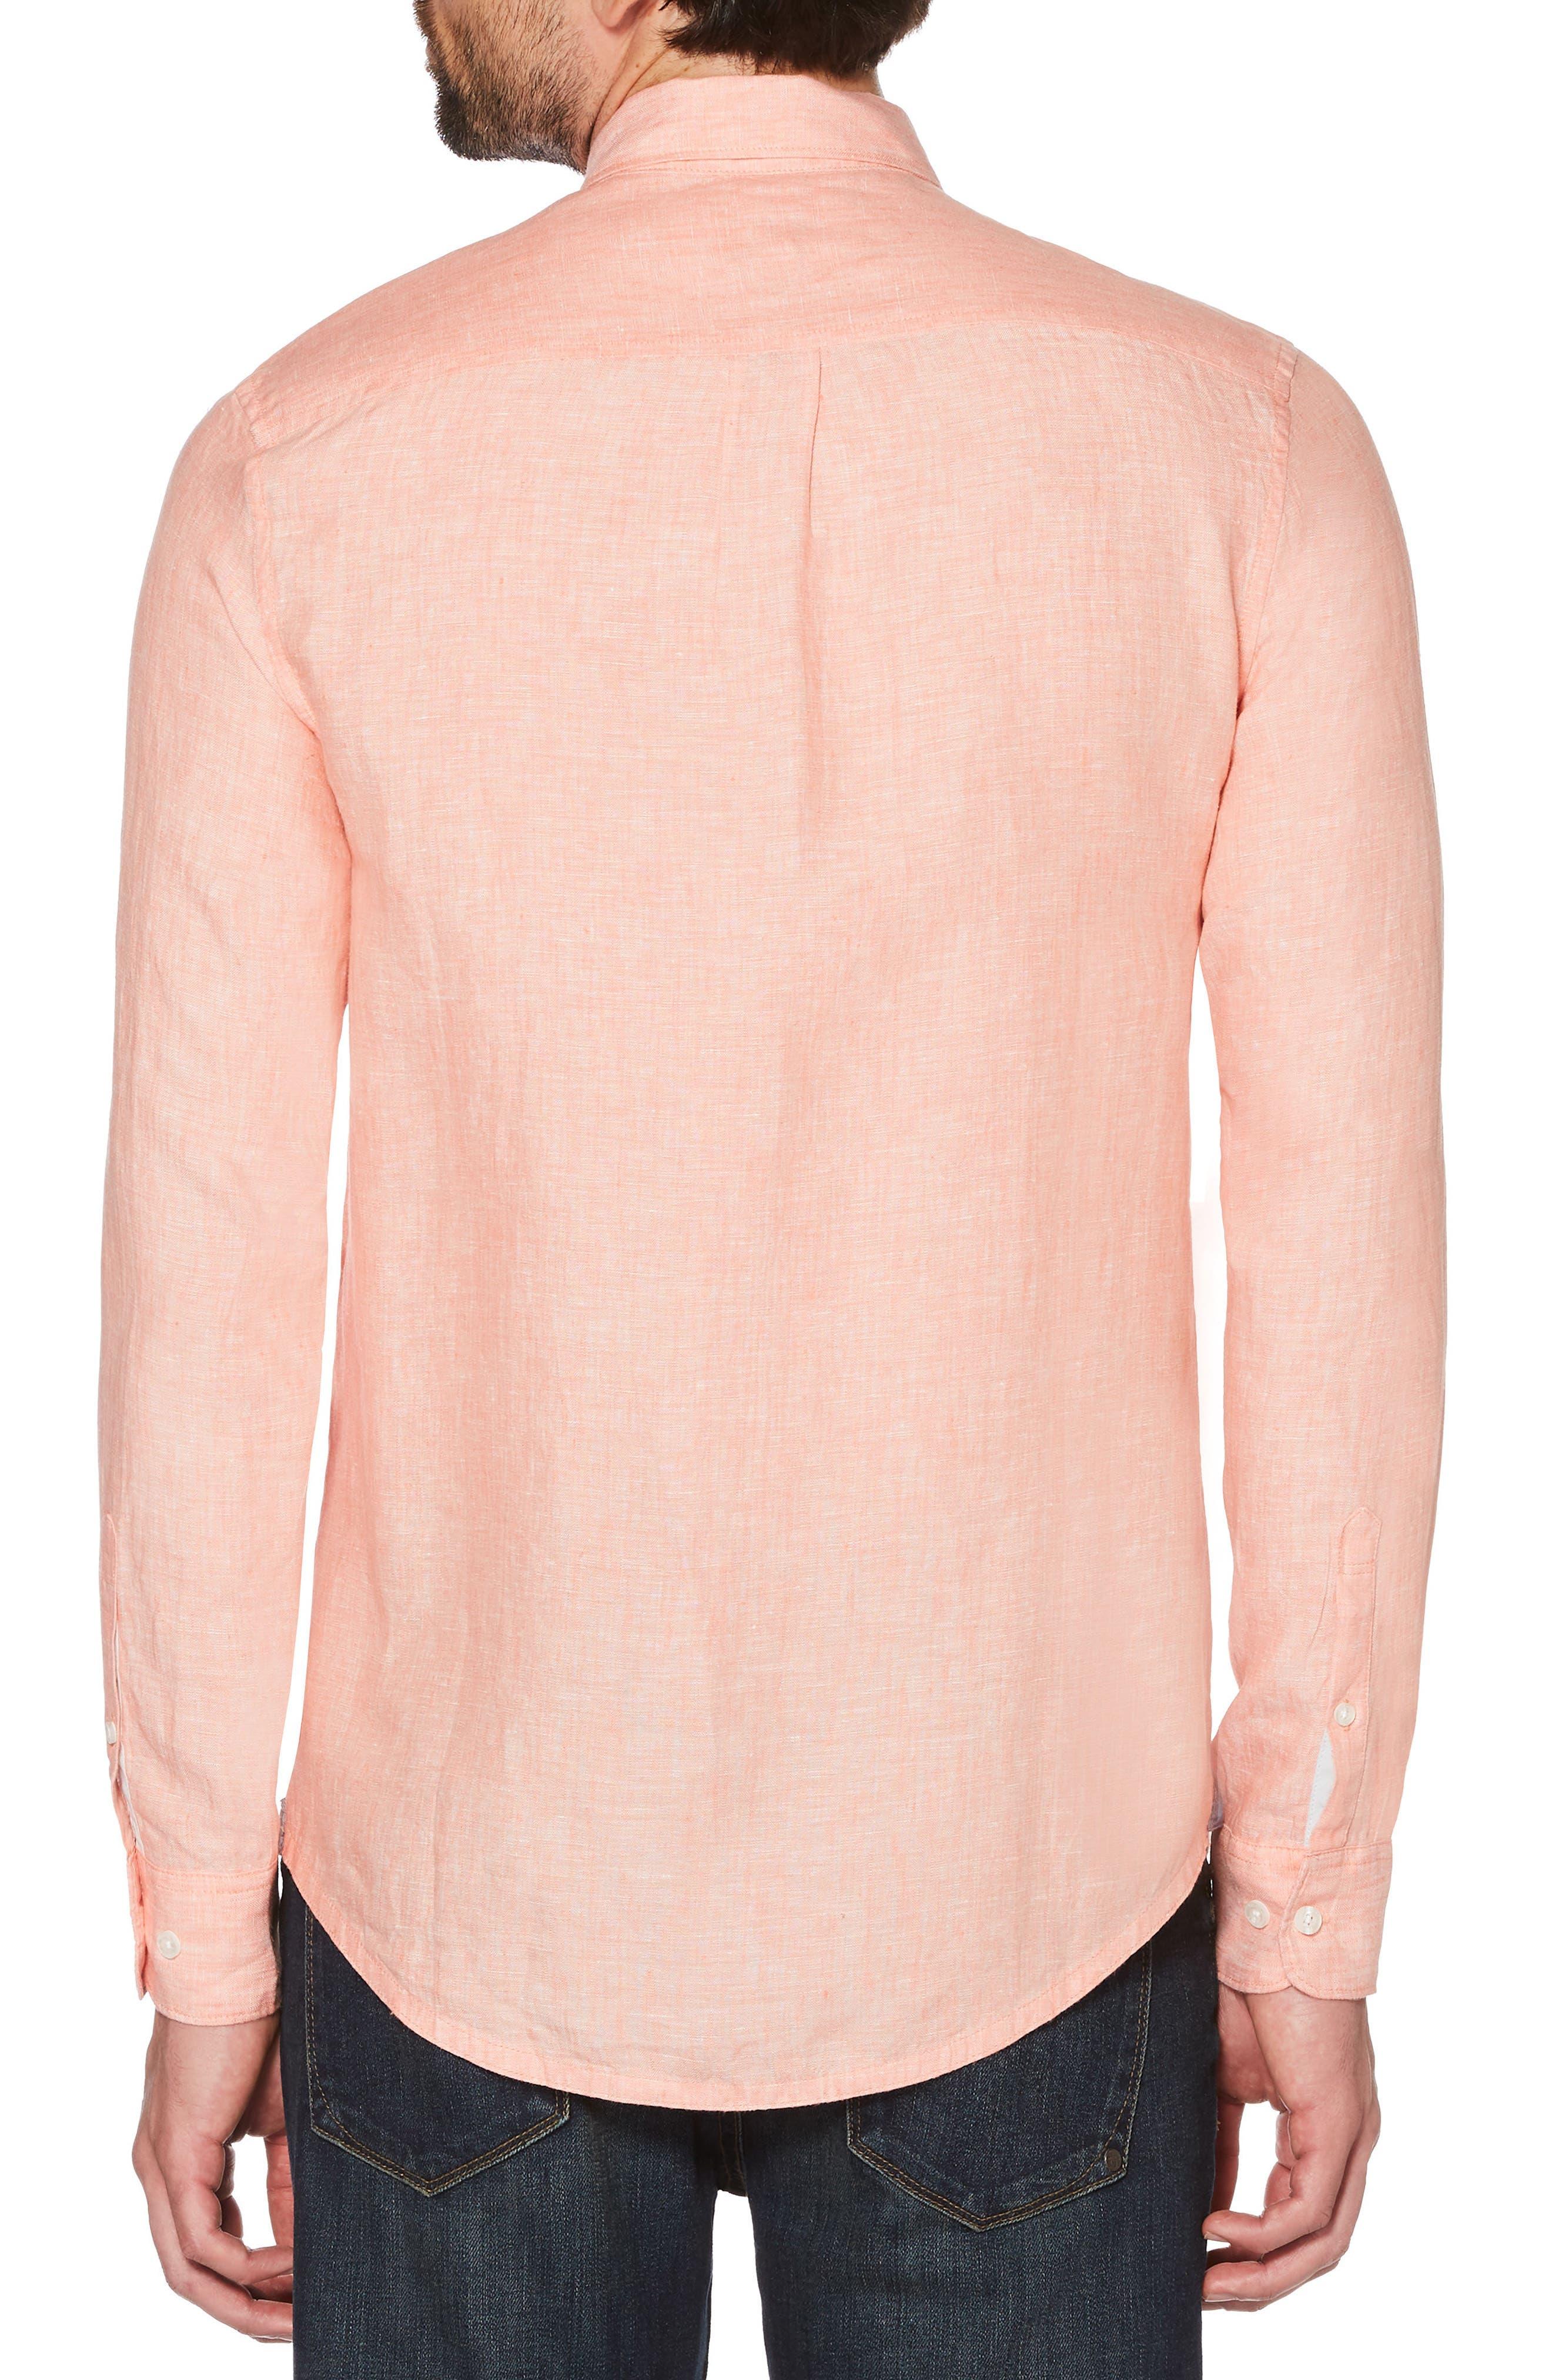 Nep Woven Shirt,                             Alternate thumbnail 2, color,                             Peach Amber